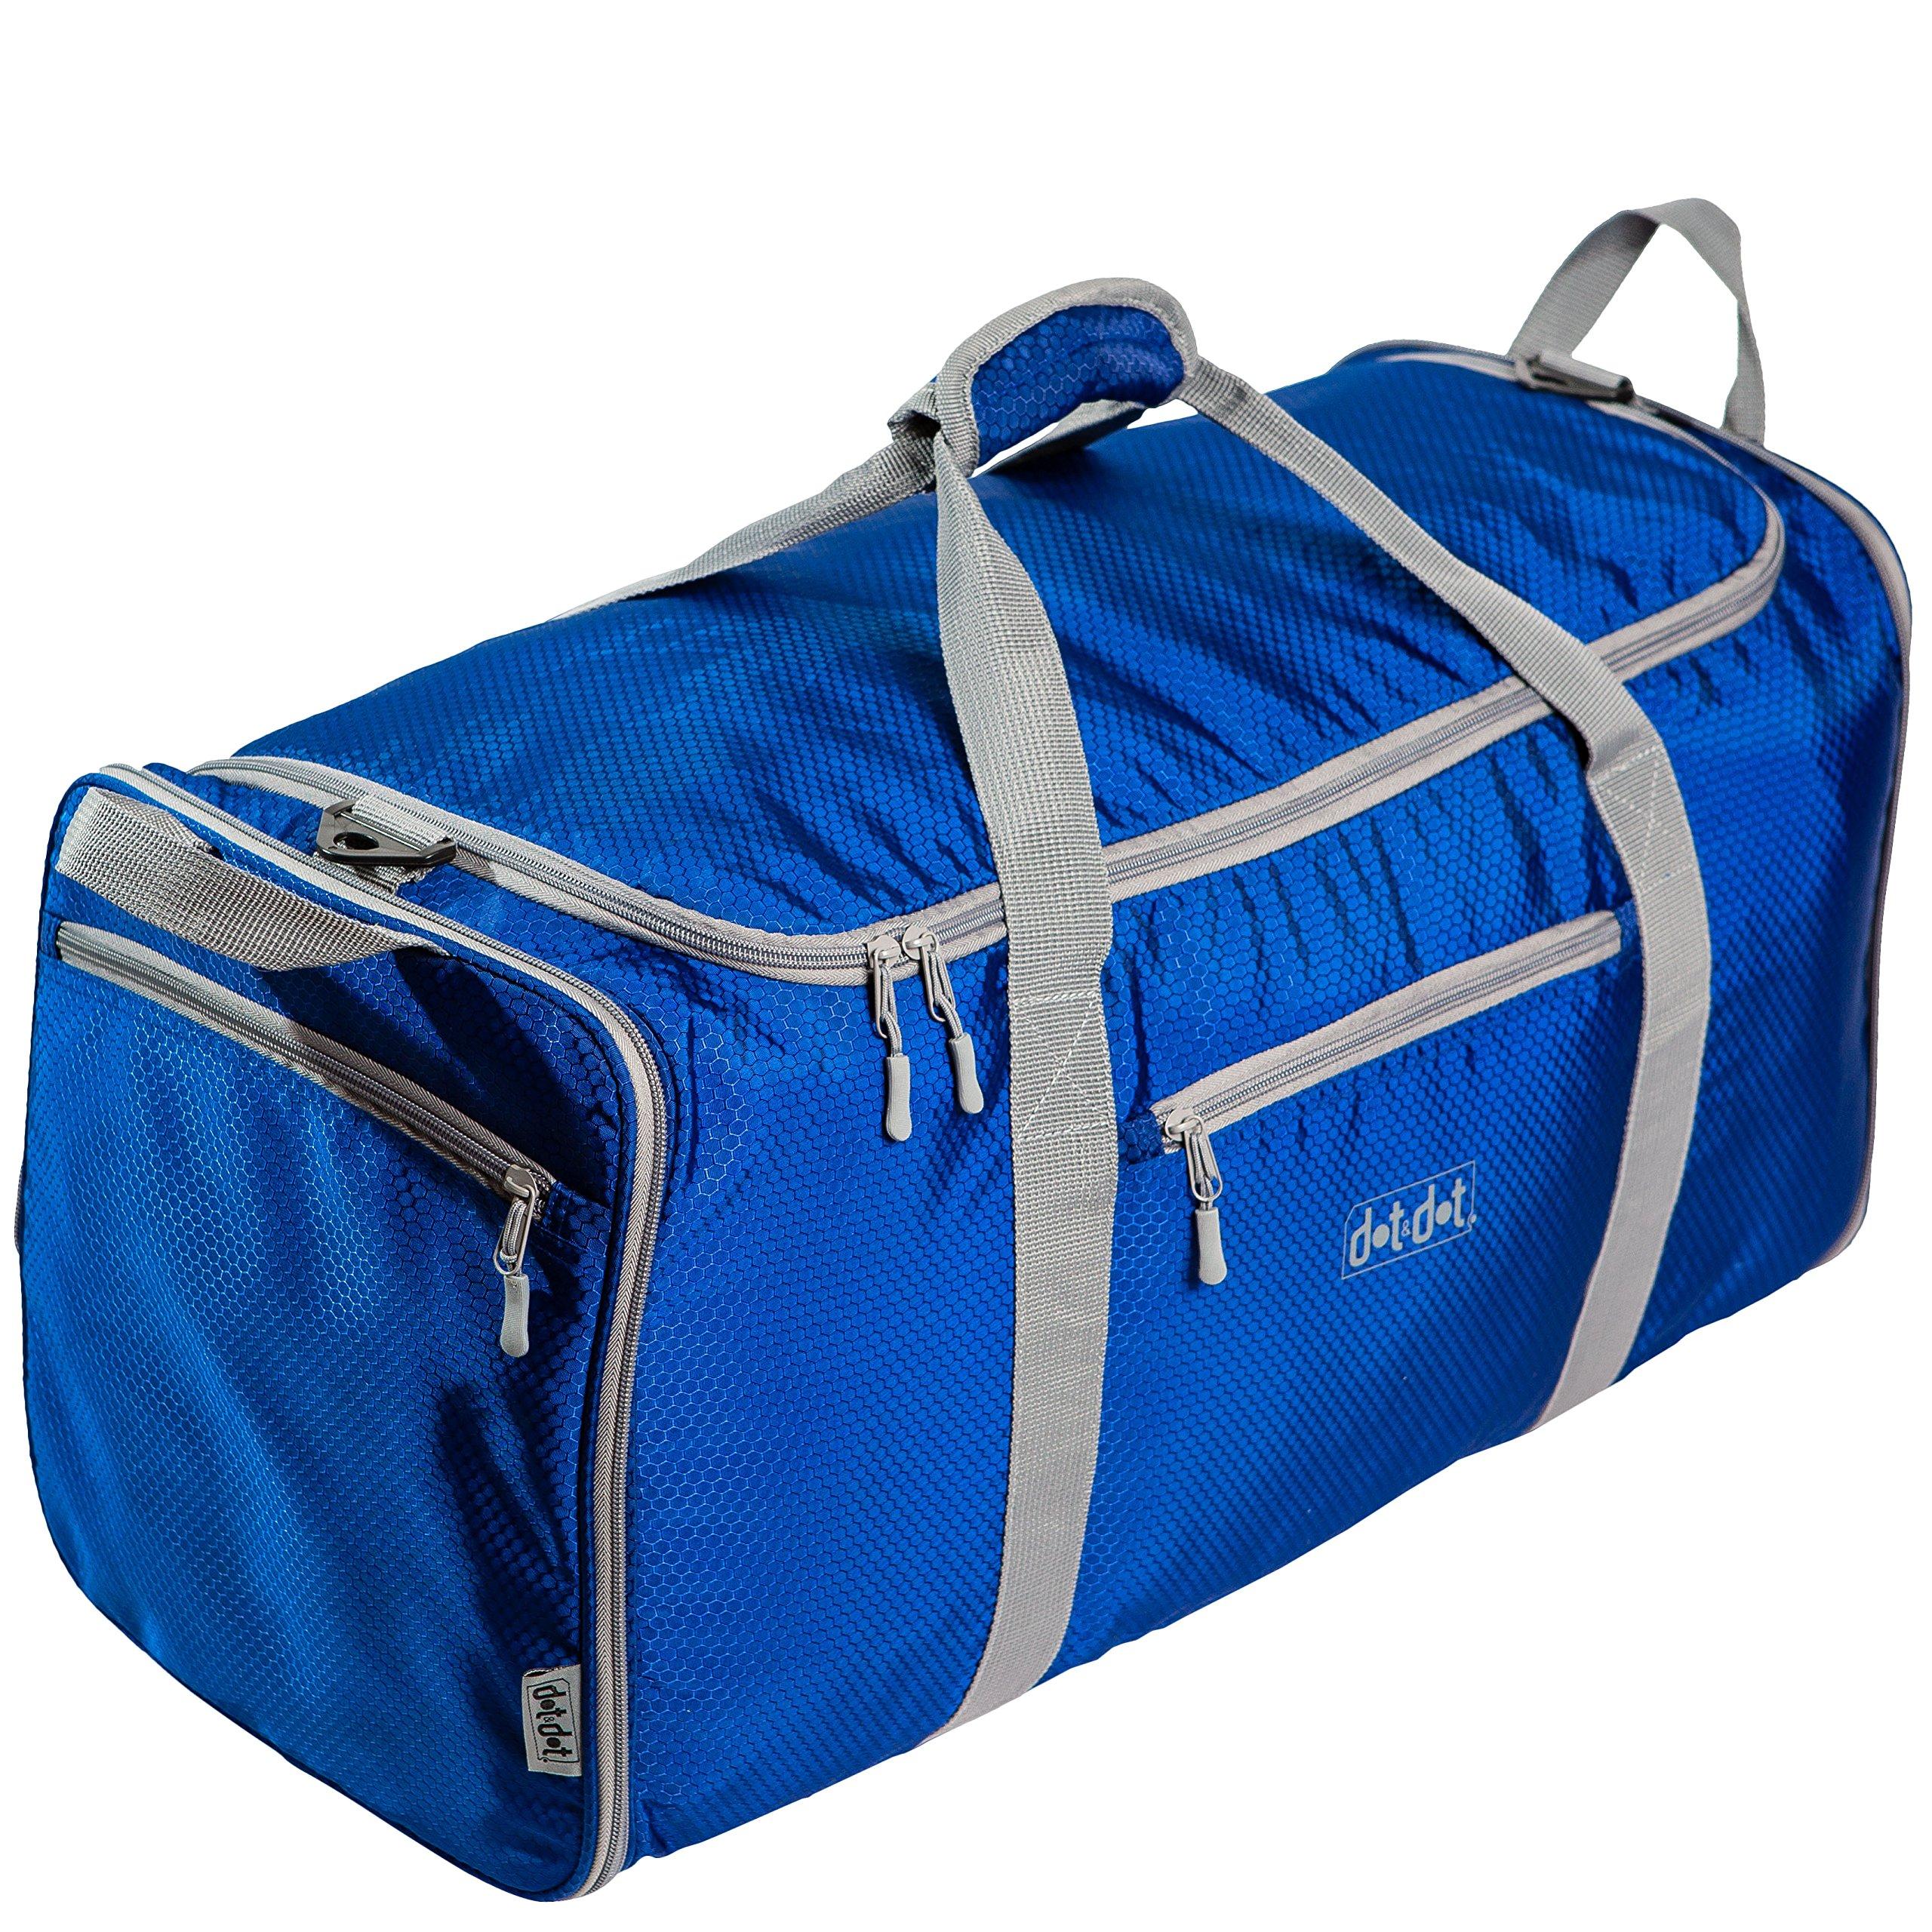 Dot&Dot Foldable Duffle Bag for Heavy Loaded Pack (27-inch, Dark Blue)